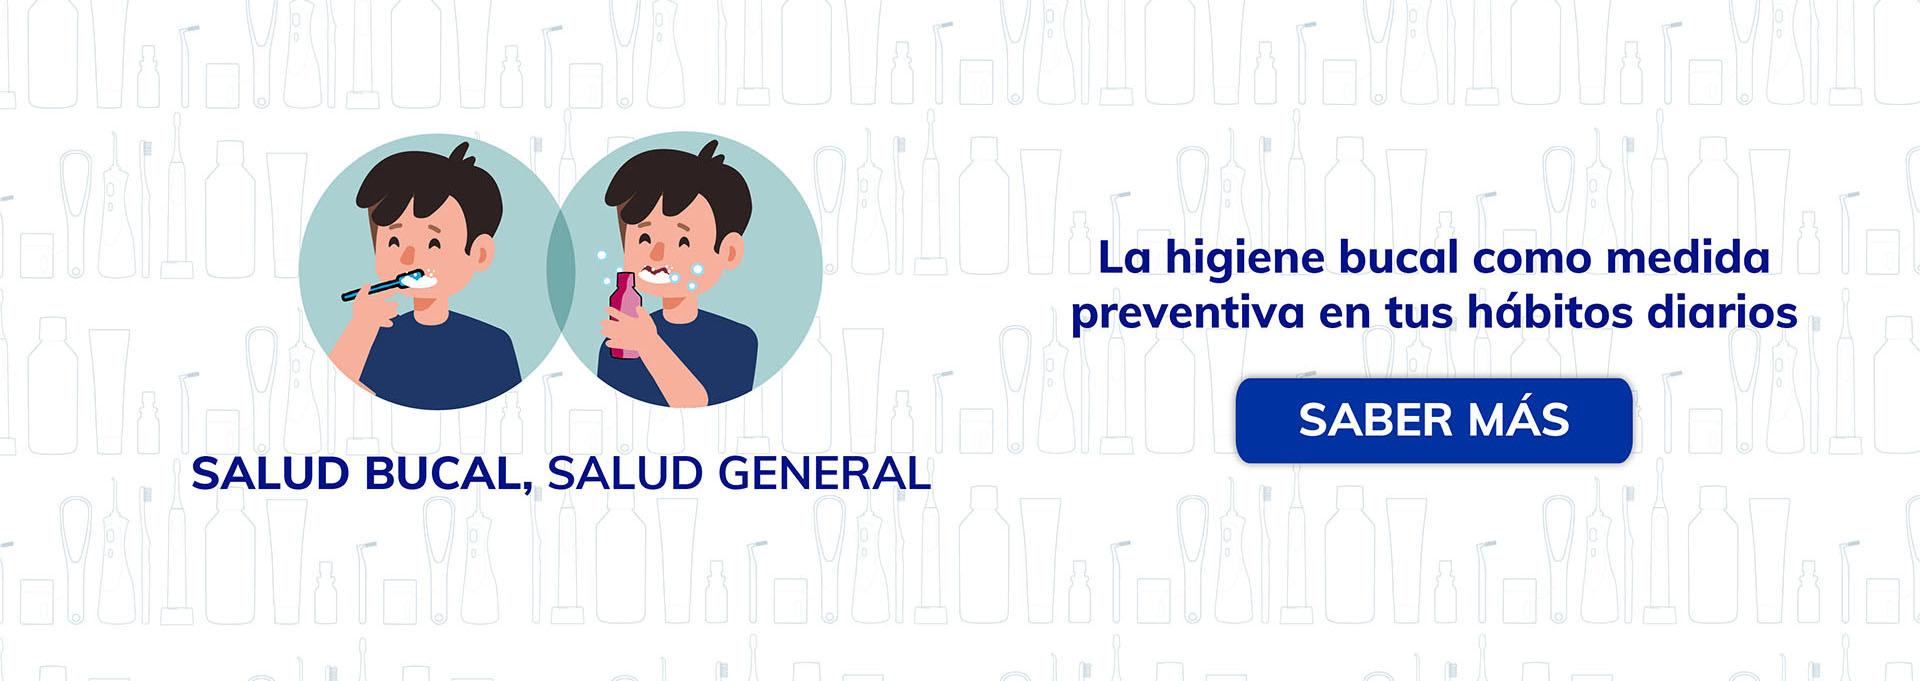 4-Medidas-higiene-bucal